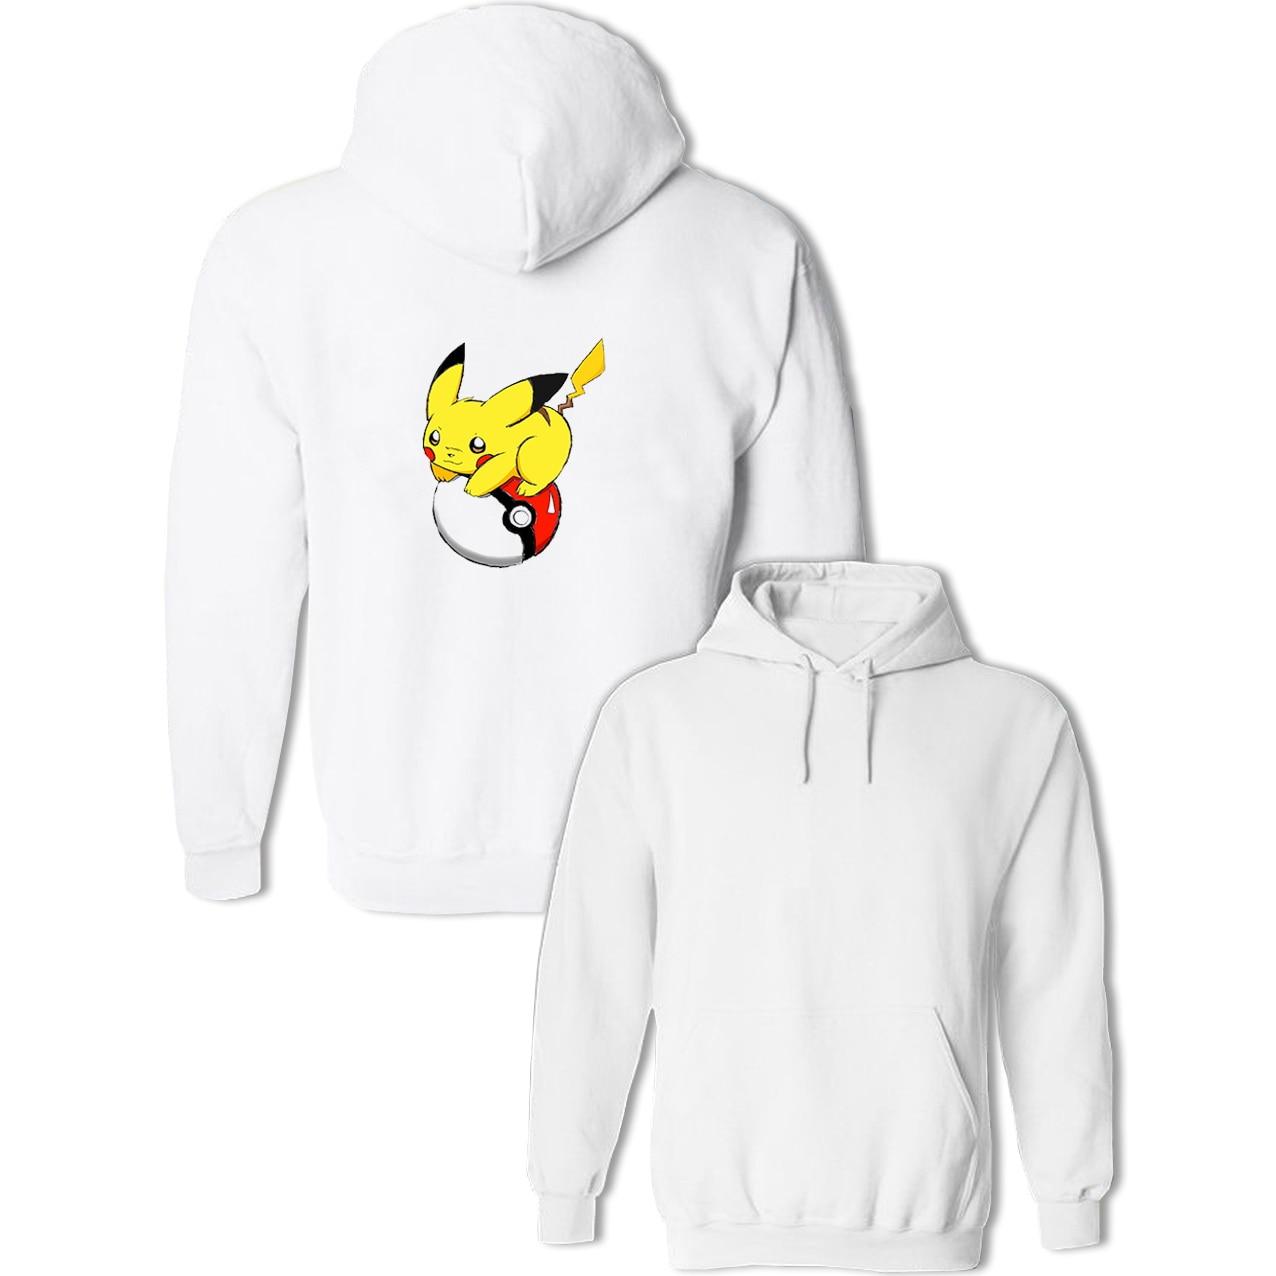 Idzn Harajuku Womens Hoodies Death Star Pokeball Star Wars Pokemon Poke Ball Casual Autumn Girl Printed Sweatshirts Tops S-3xl Women's Clothing